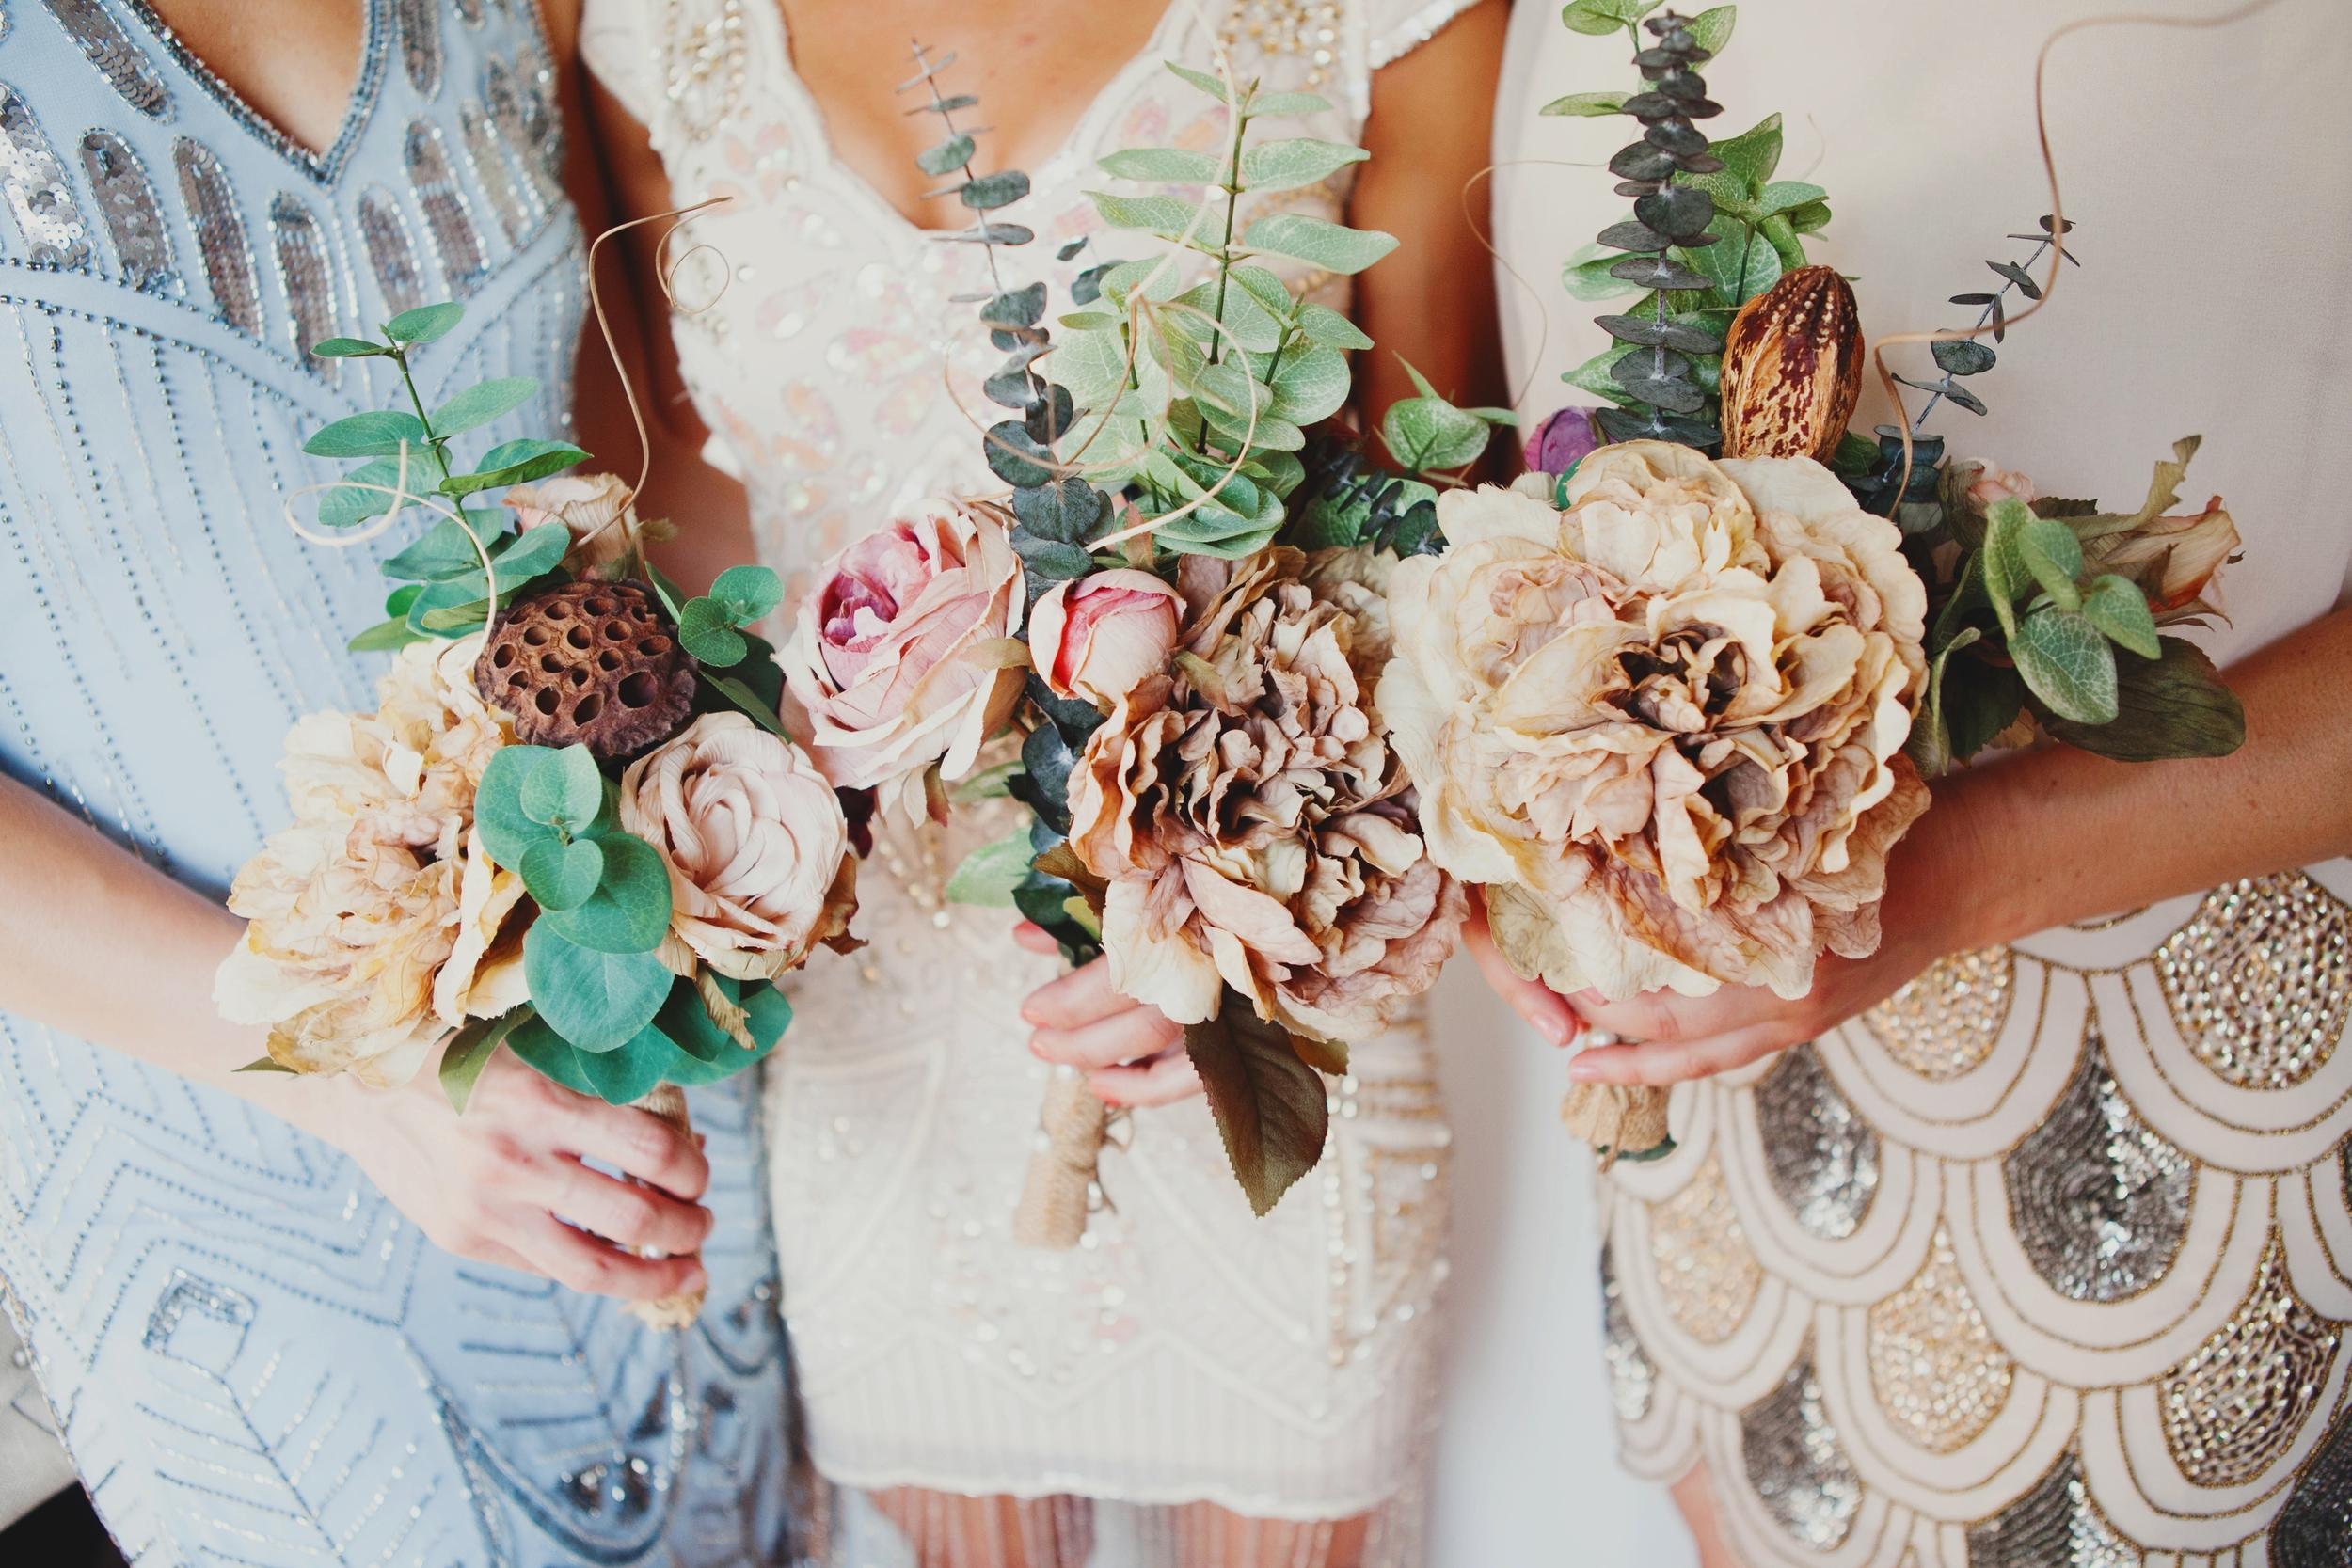 The Suitcase Studio - Lifestyle Wedding Photography in Bend Oregon